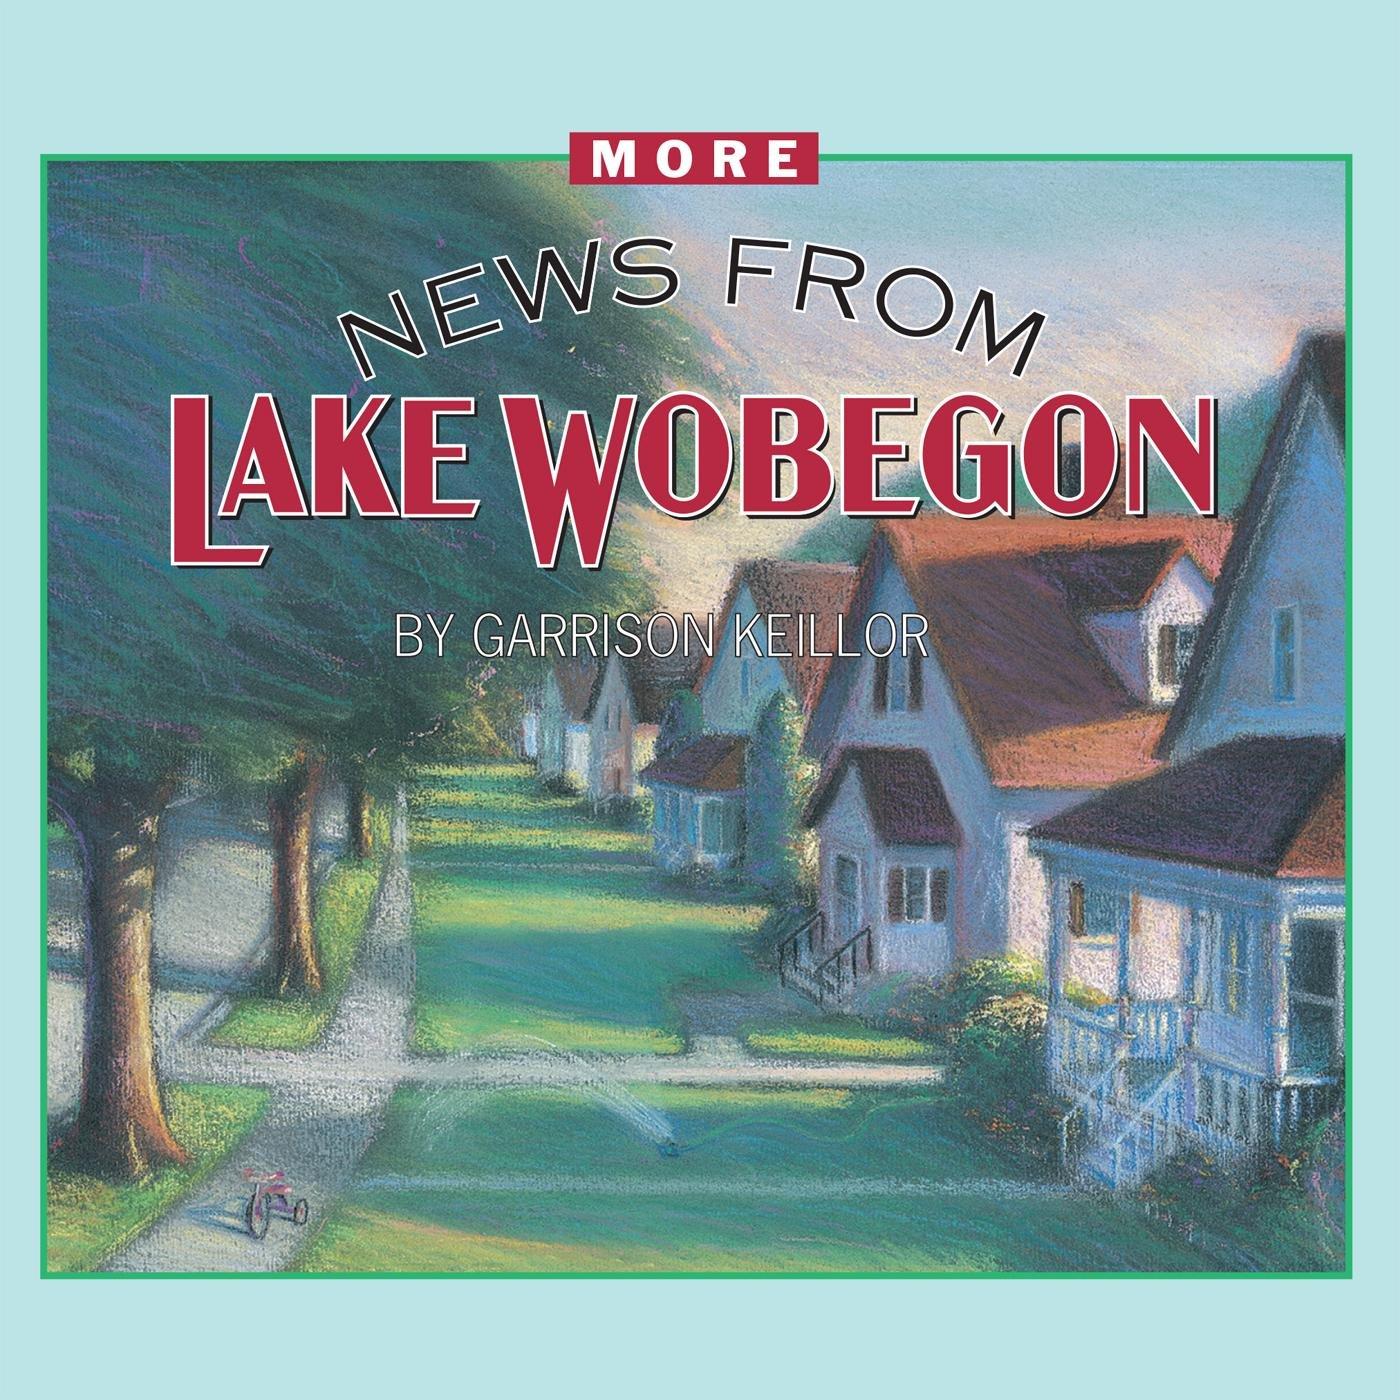 More News from Lake Wobegon: Garrison Keillor: 9780942110371: Amazon.com:  Books